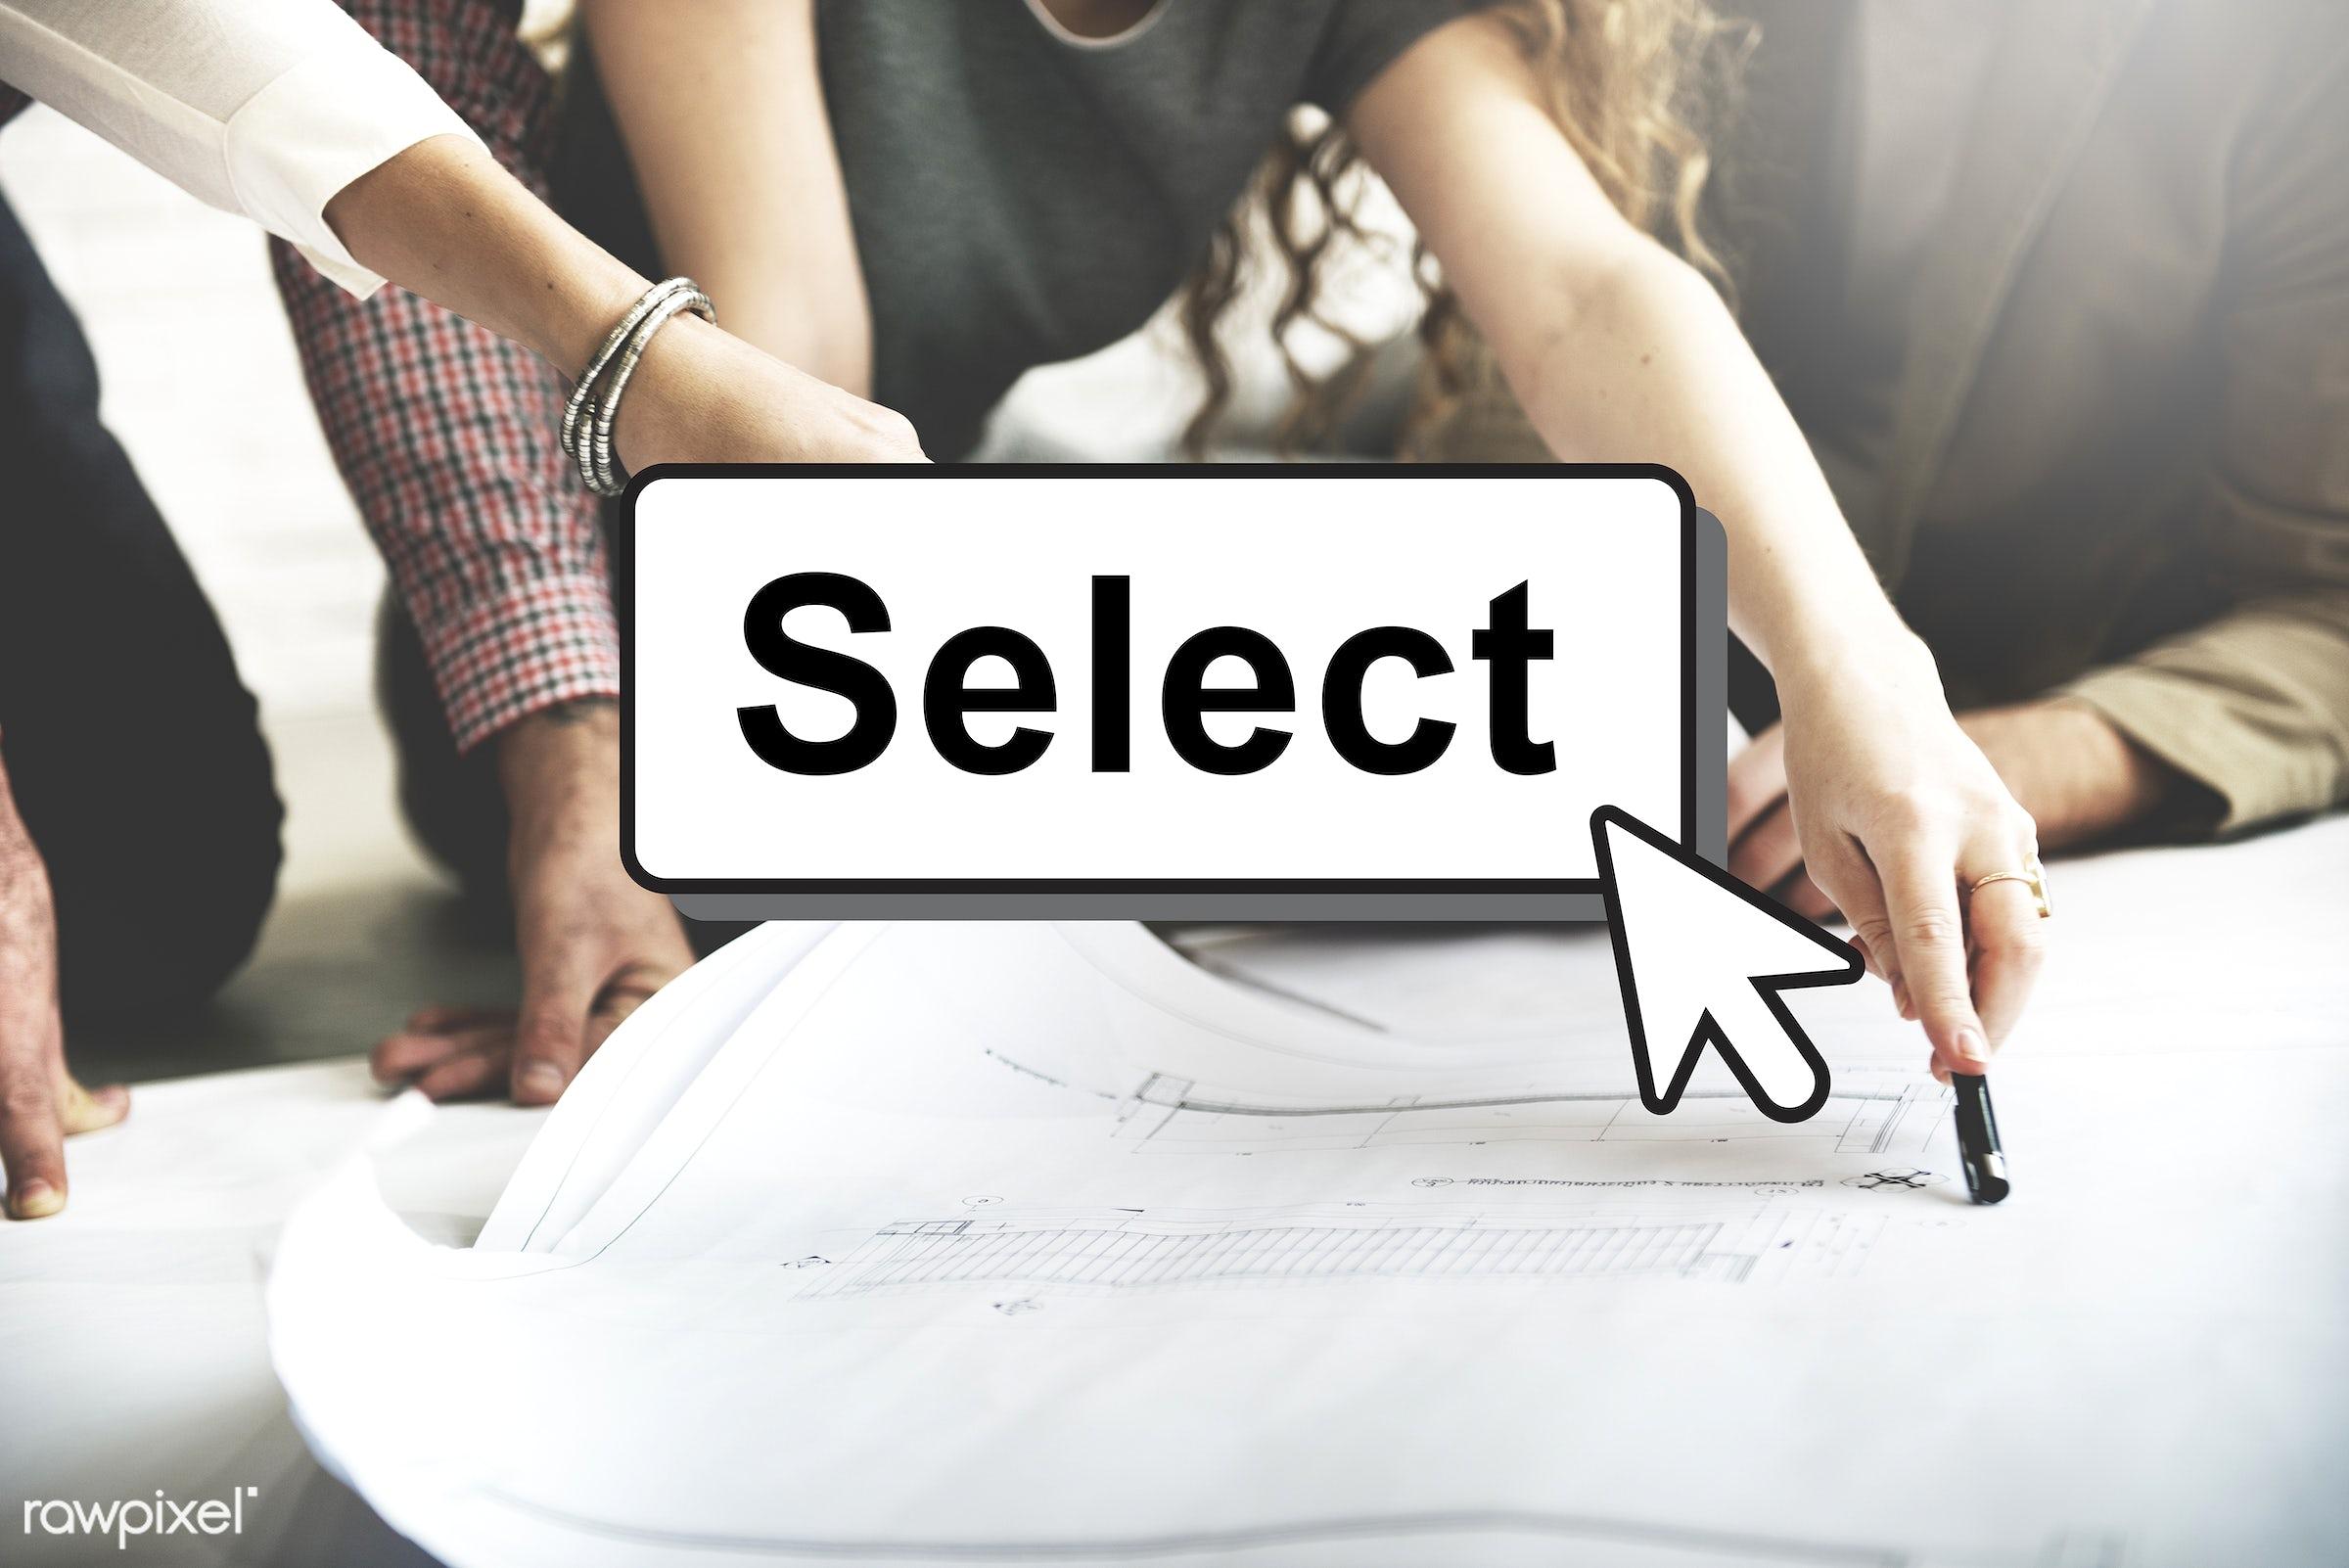 choice, analysing, analysis, answer, blueprint, business, businessmen, businesswomen, choose, choosing, colleagues, compare...